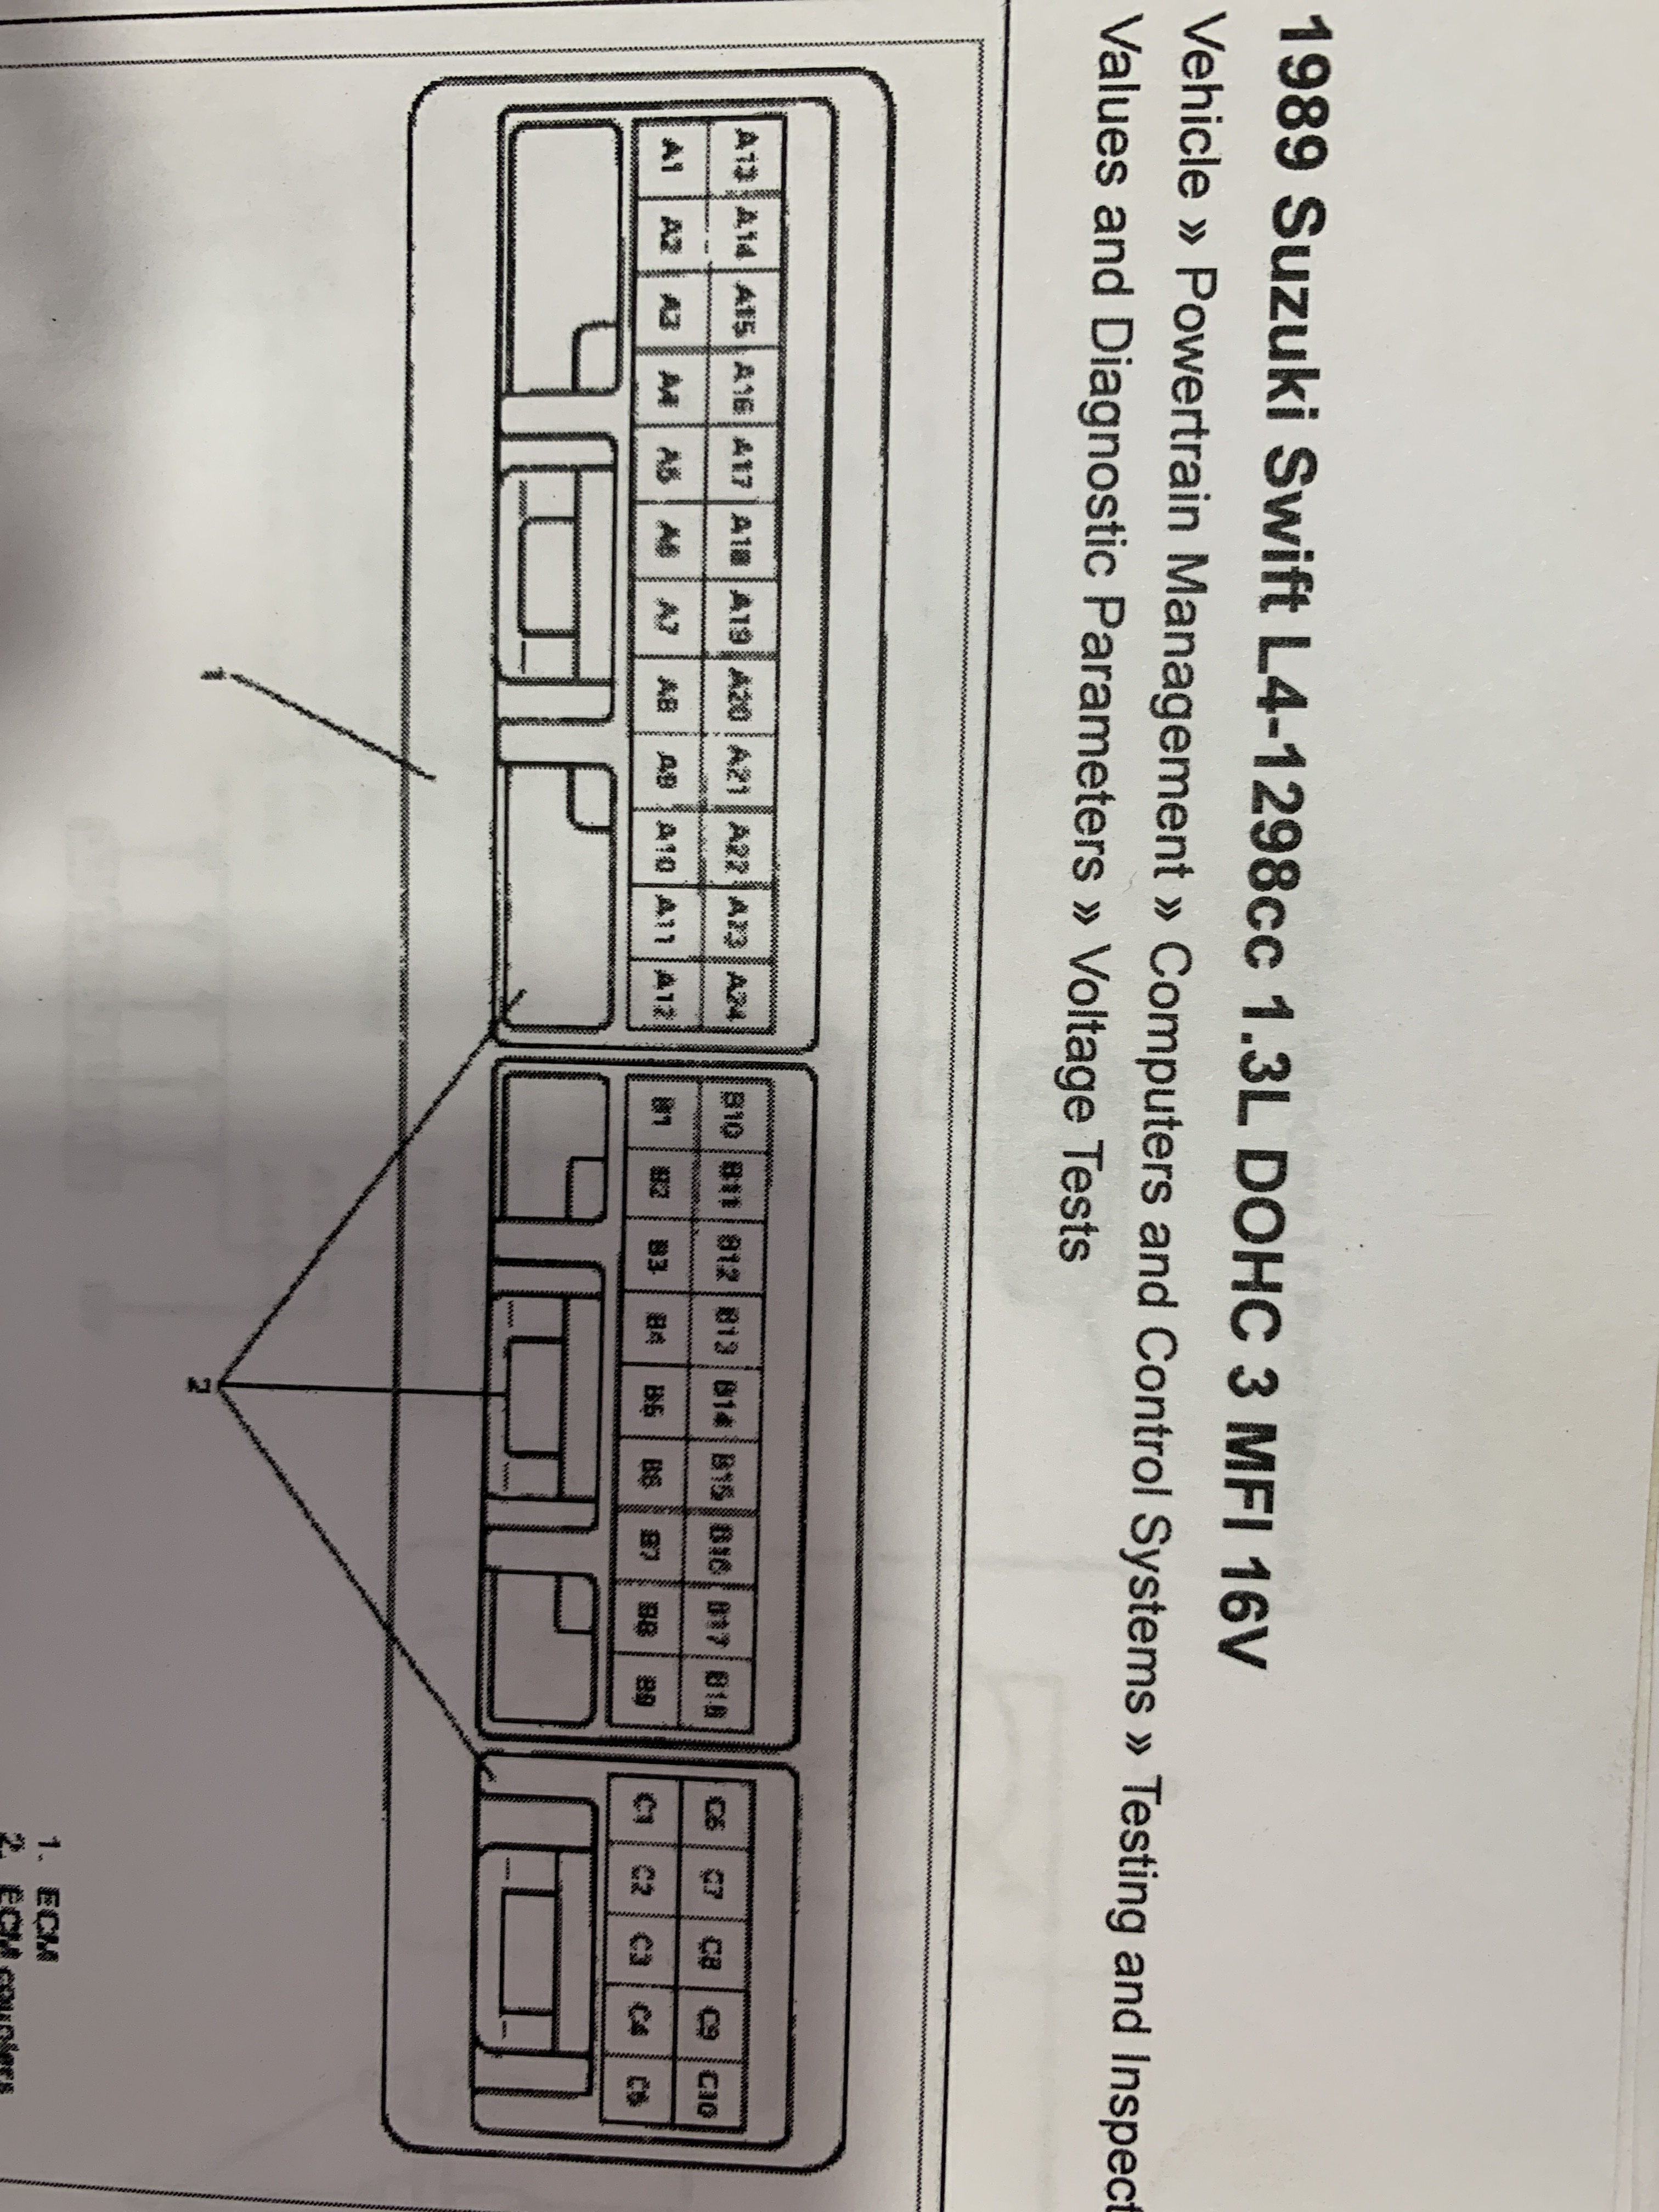 Suzuki Ignis Ecu Wiring Diagram